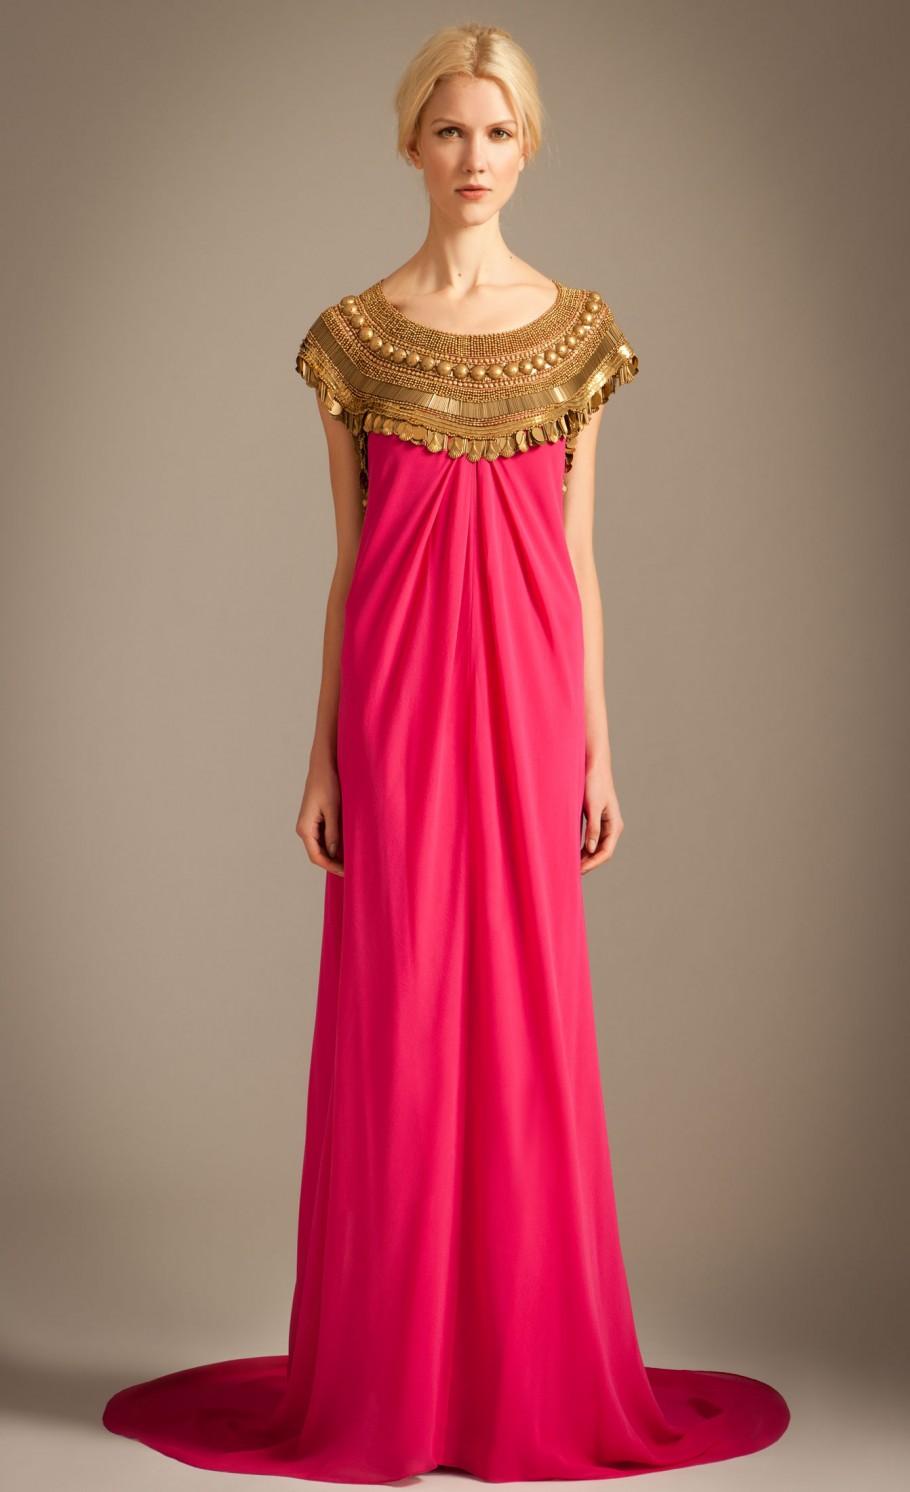 The dress goddess - Gallery